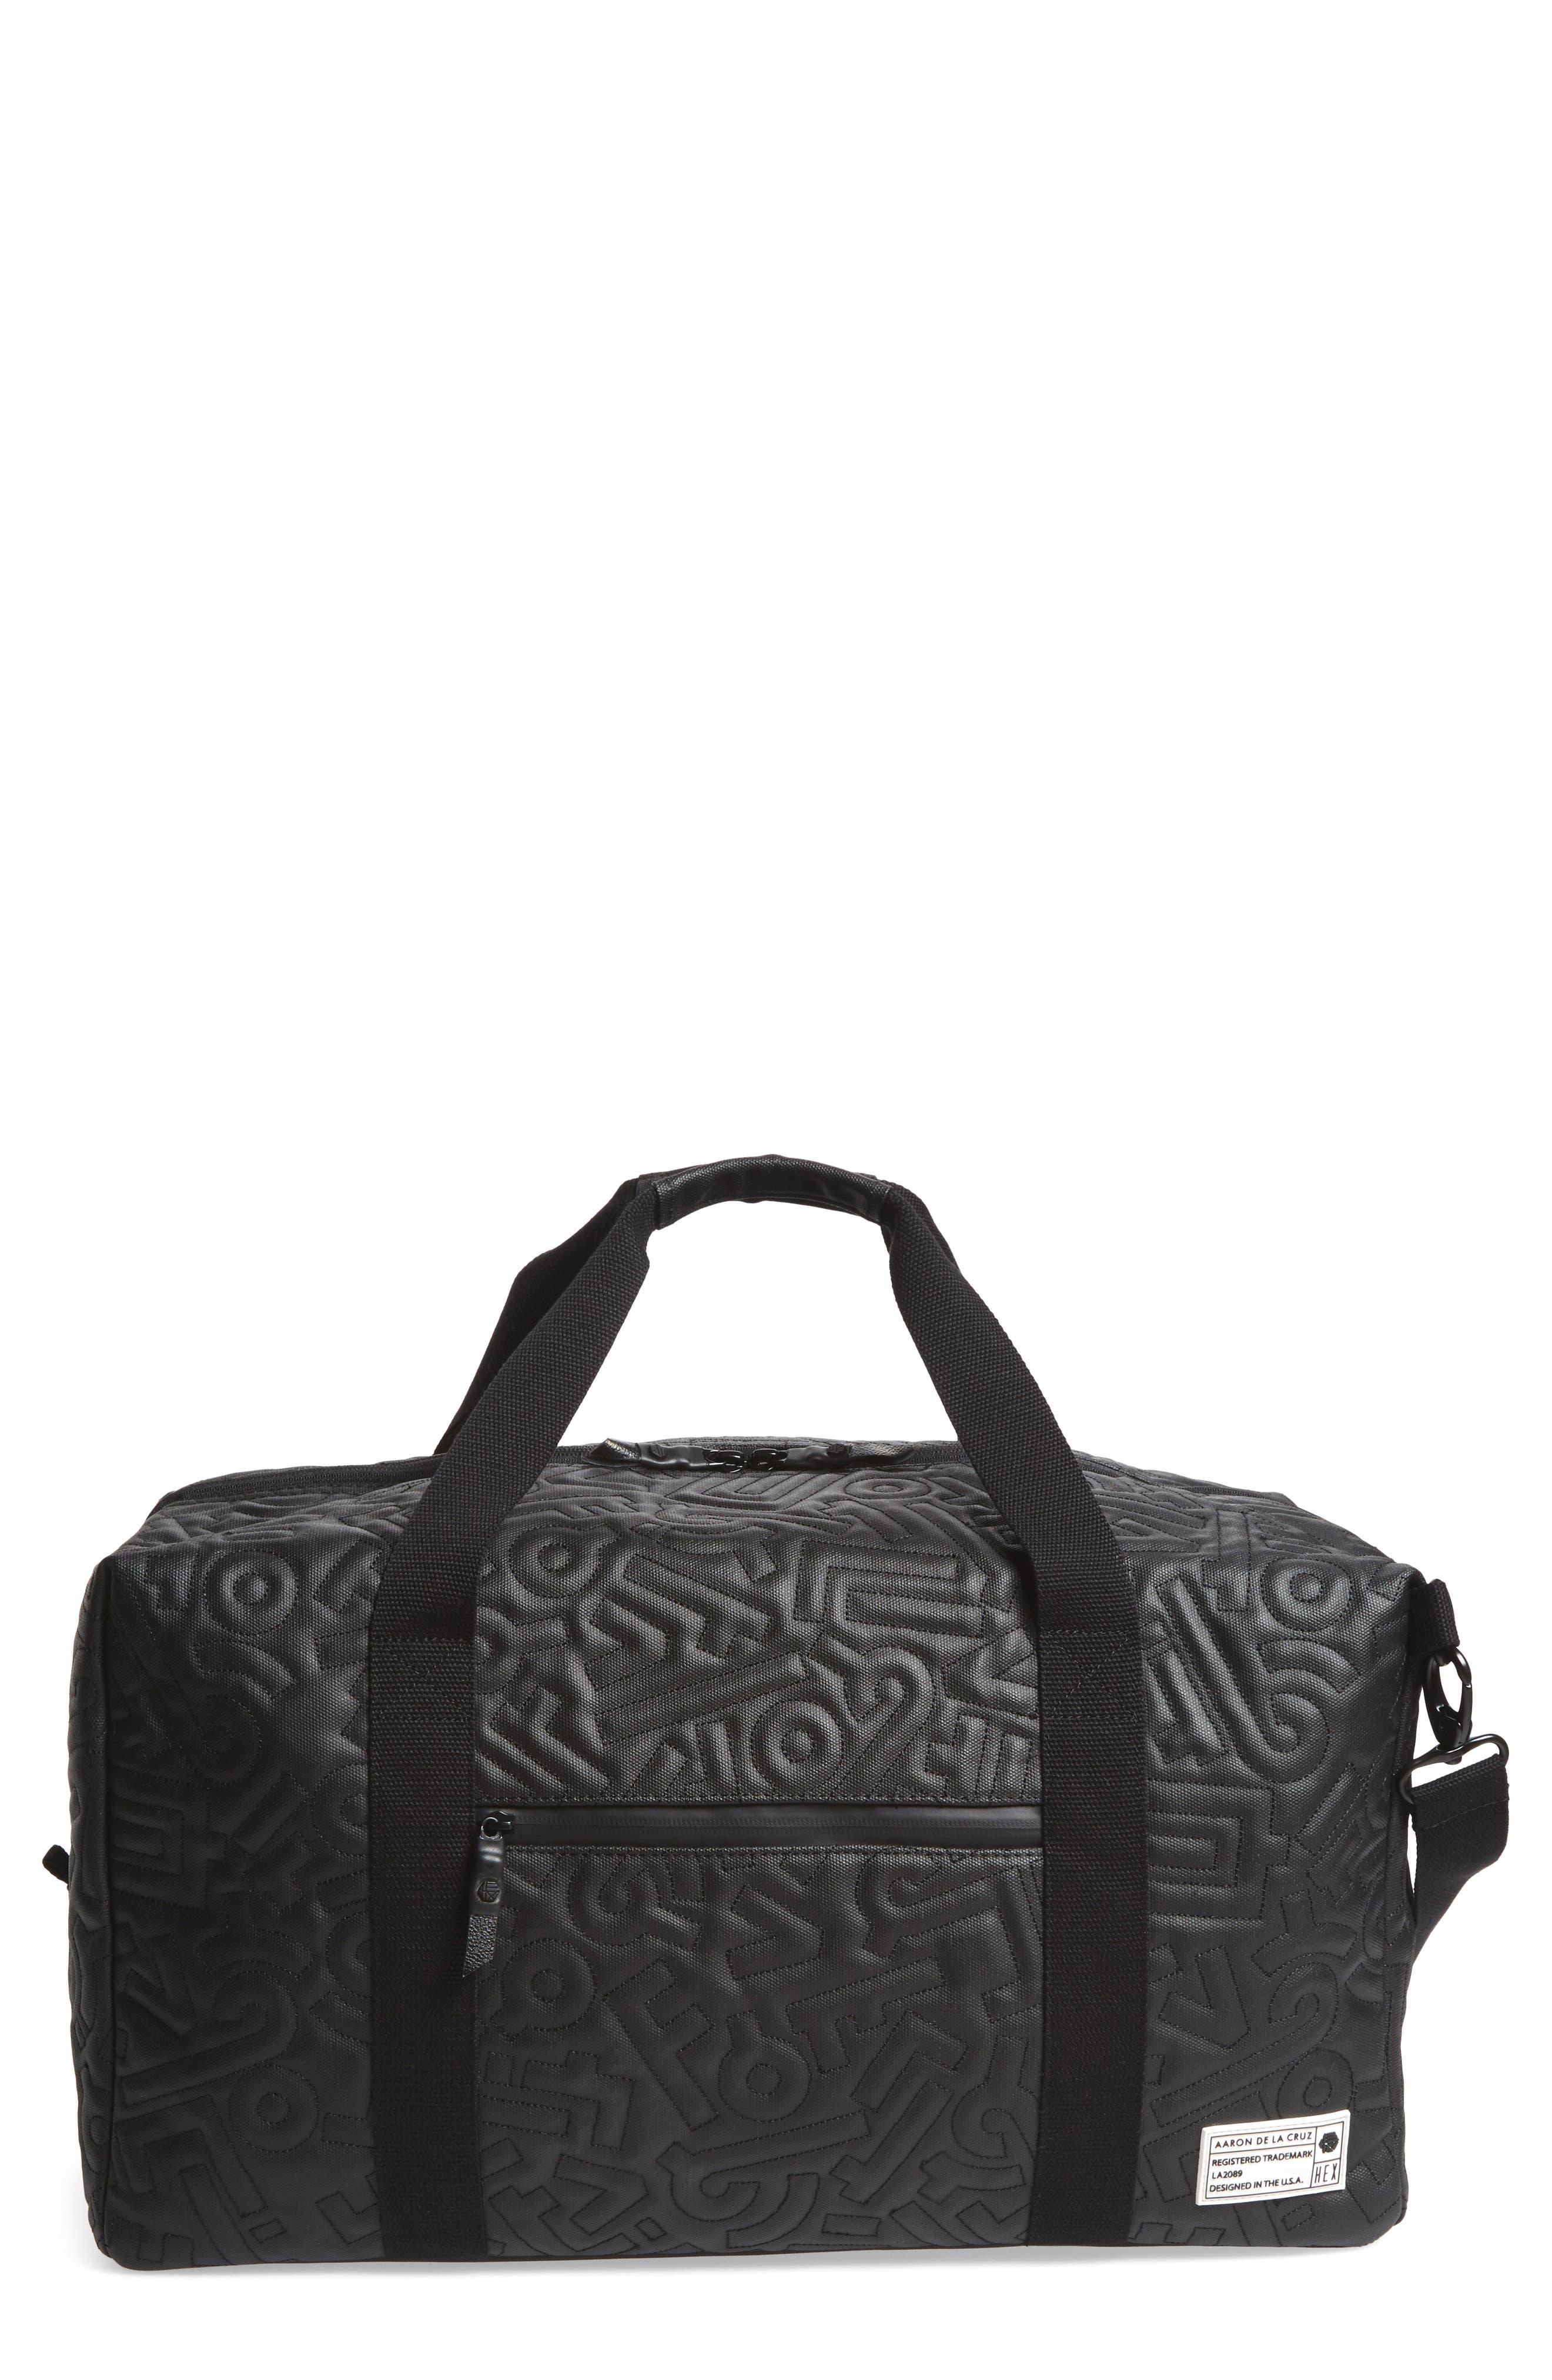 HEX x Aaron De La Cruz Drifter Duffel Bag